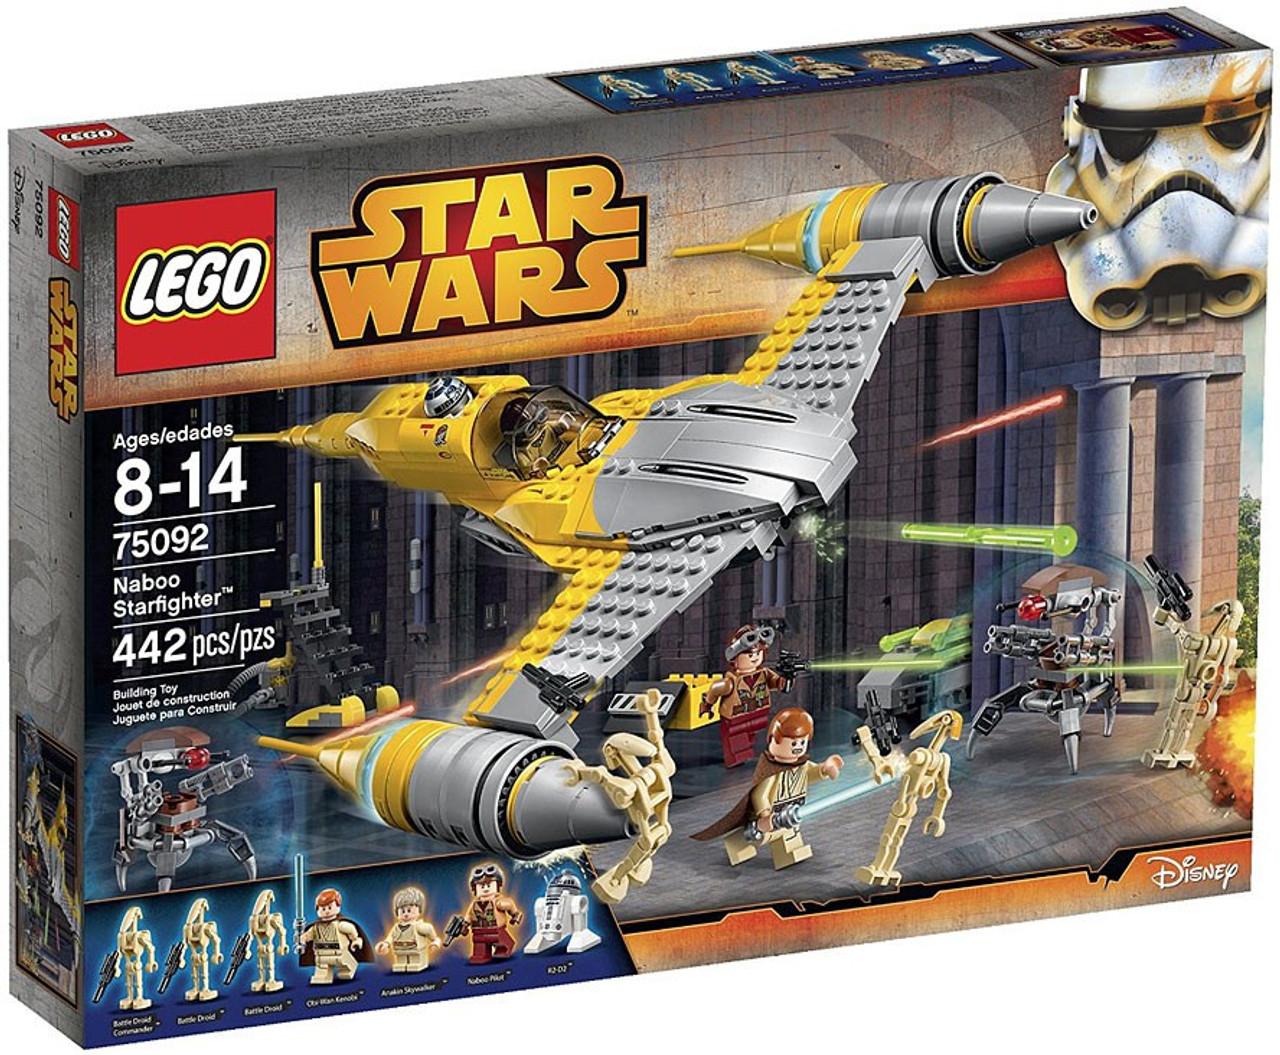 LEGO Star Wars The Phantom Menace Naboo Starfighter Set #75092